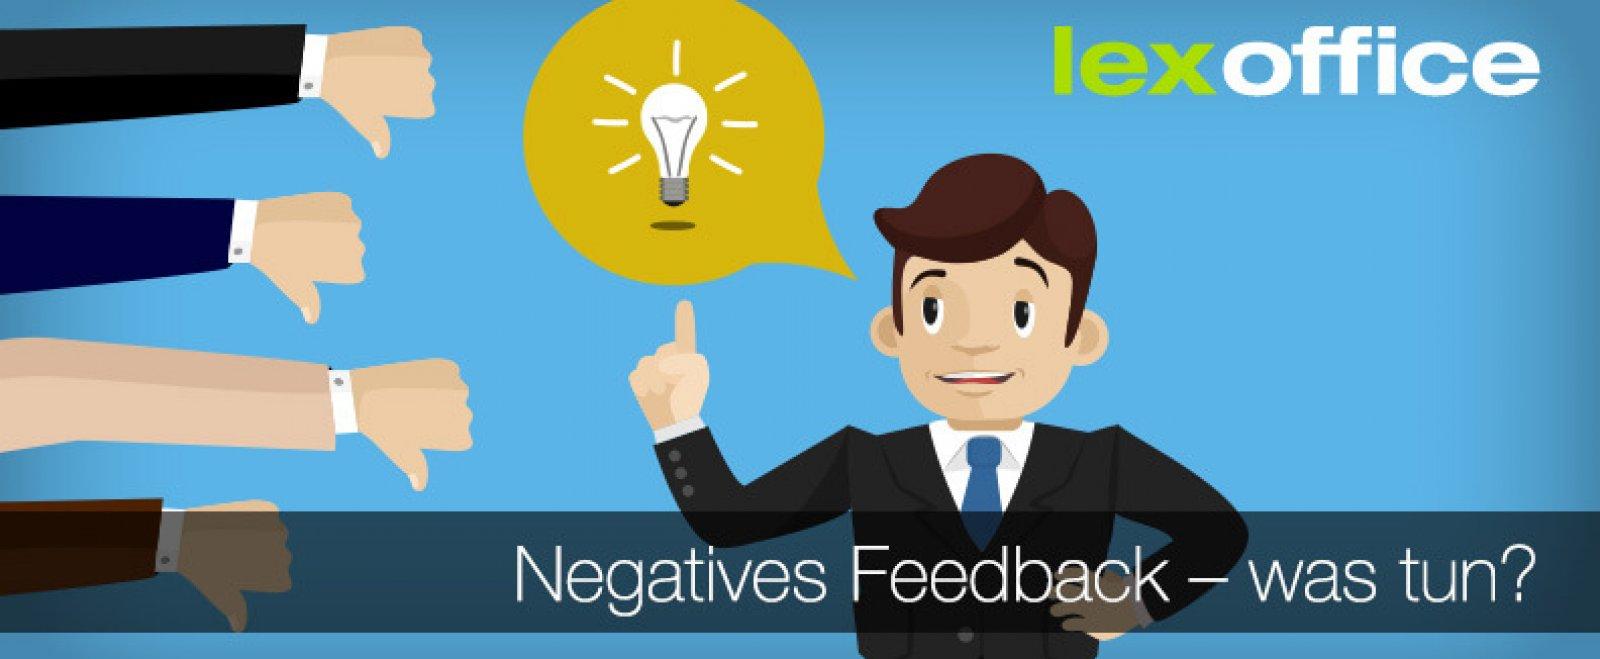 Negatives Feedback - was tun?